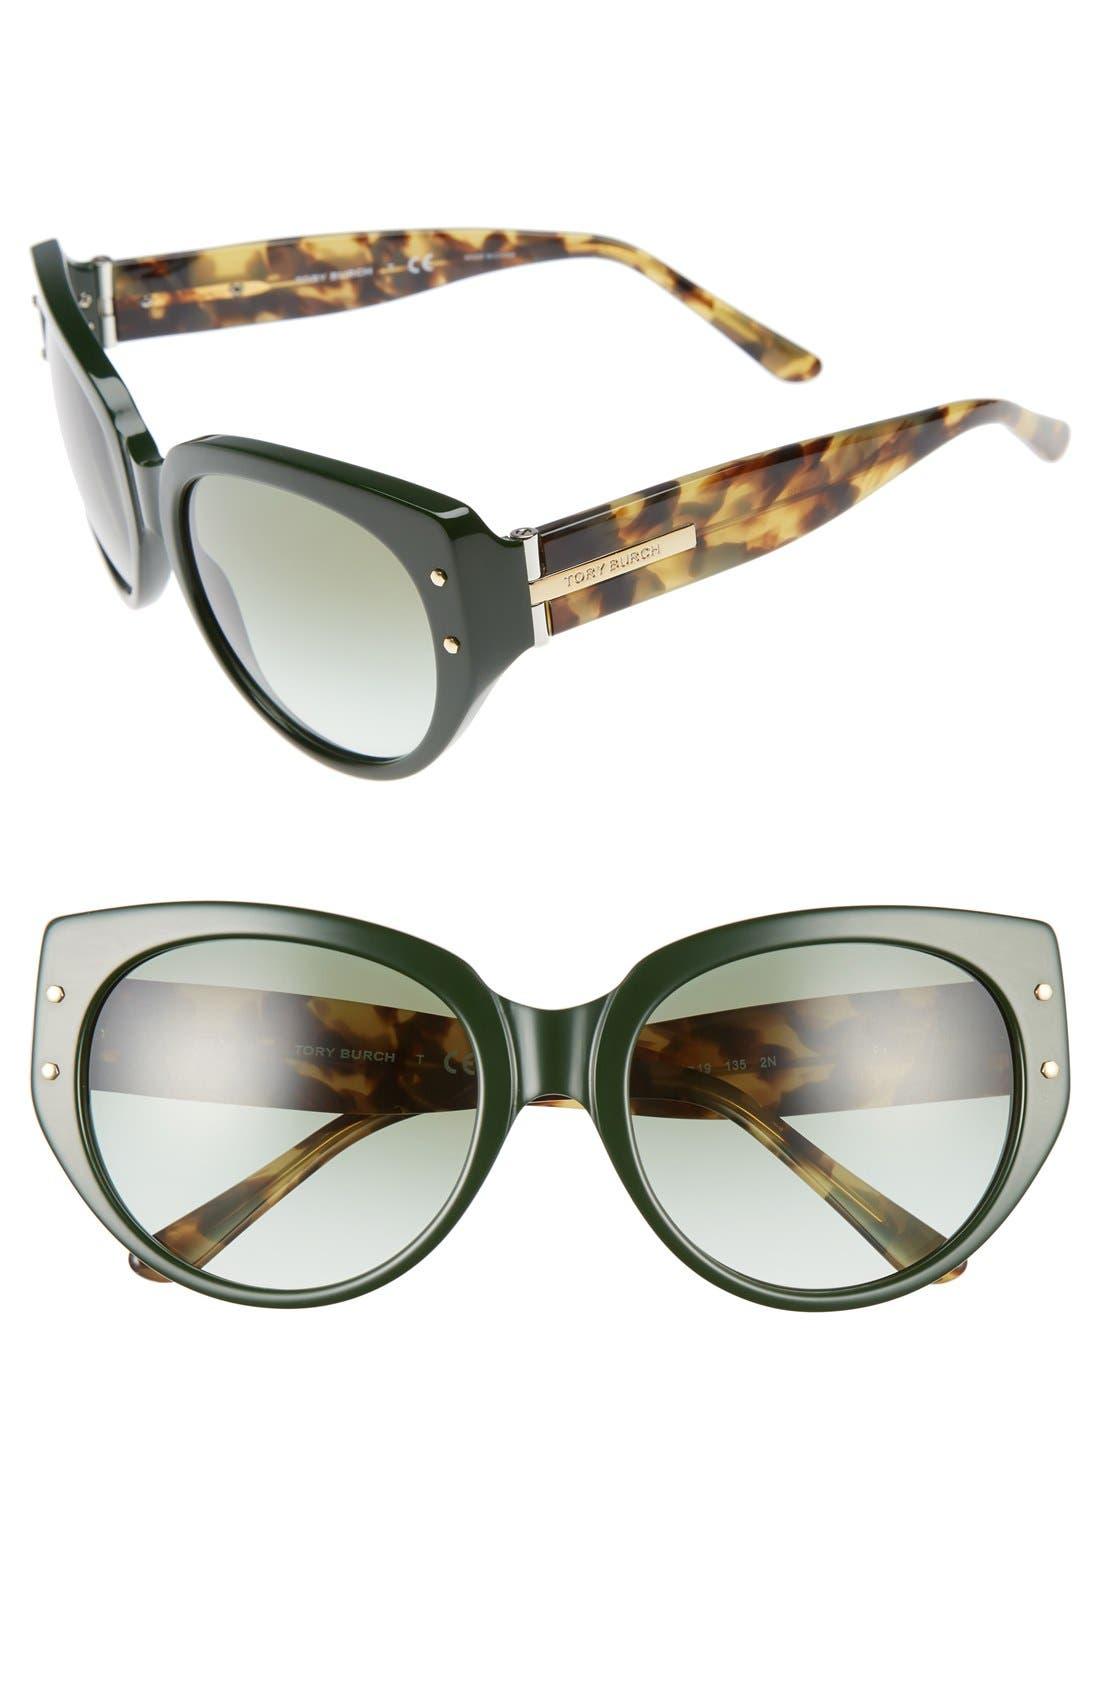 Main Image - Tory Burch 55mm Sunglasses